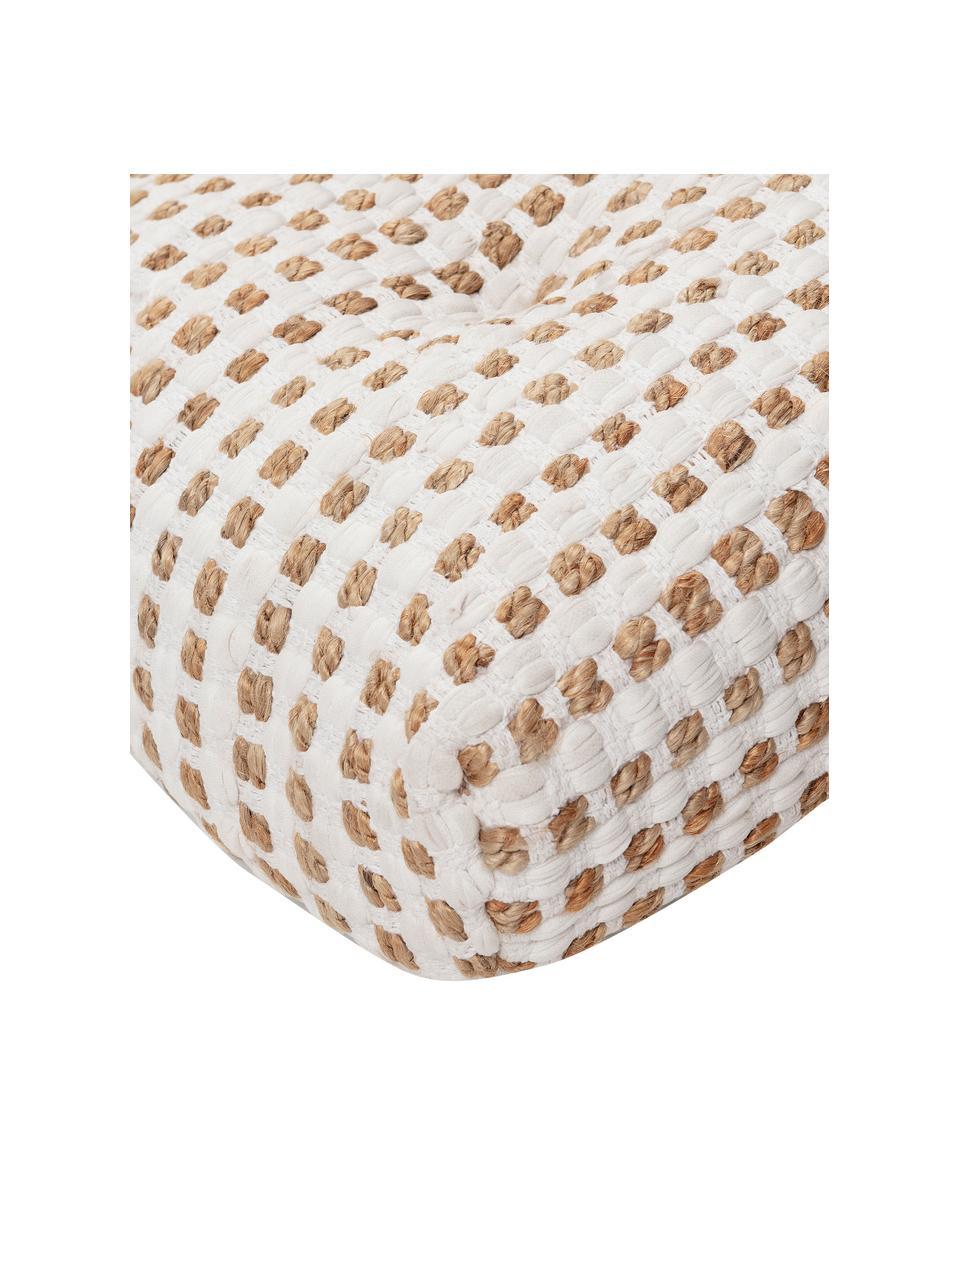 Cuscino da pavimento boho in cotone/juta Fiesta, Rivestimento: 55% cotone chindi, 45% ju, Bianco, beige, Larg. 120 x Alt. 13 cm